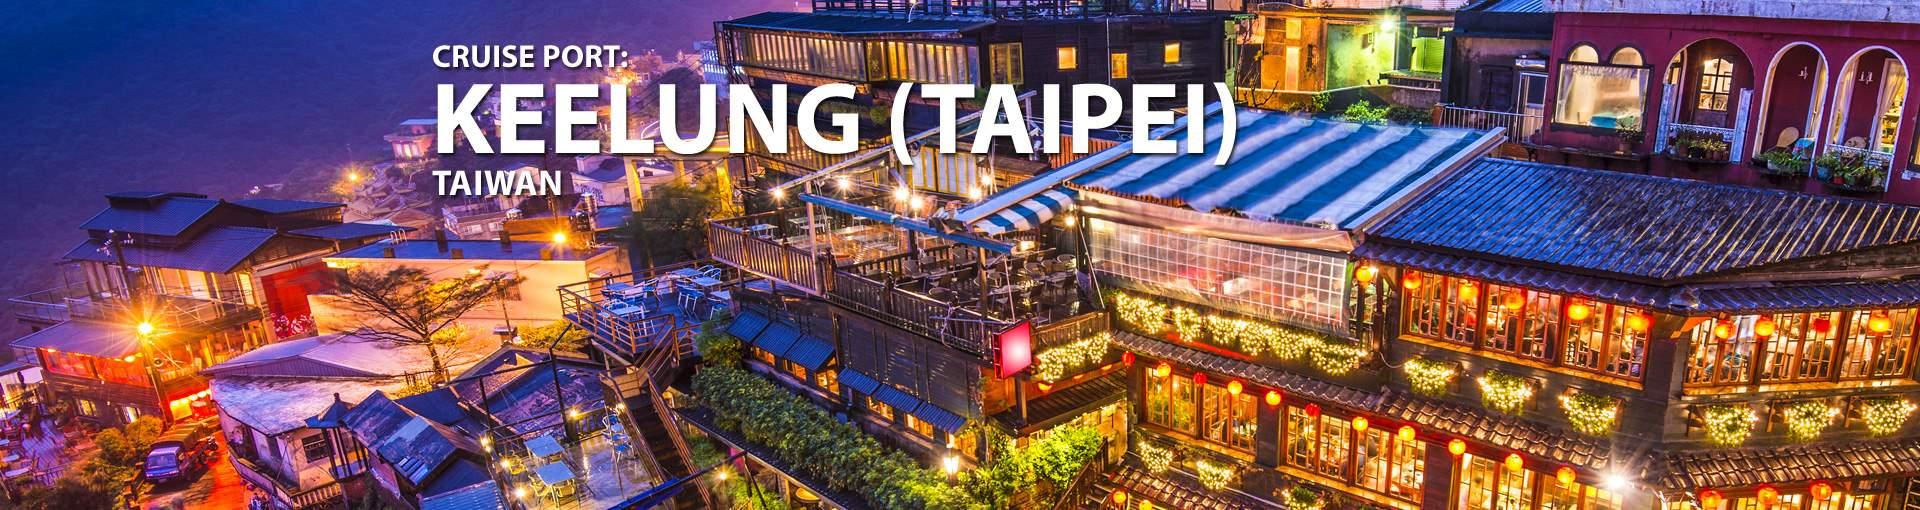 Cruise Port: Keelung Taipei, Taiwan